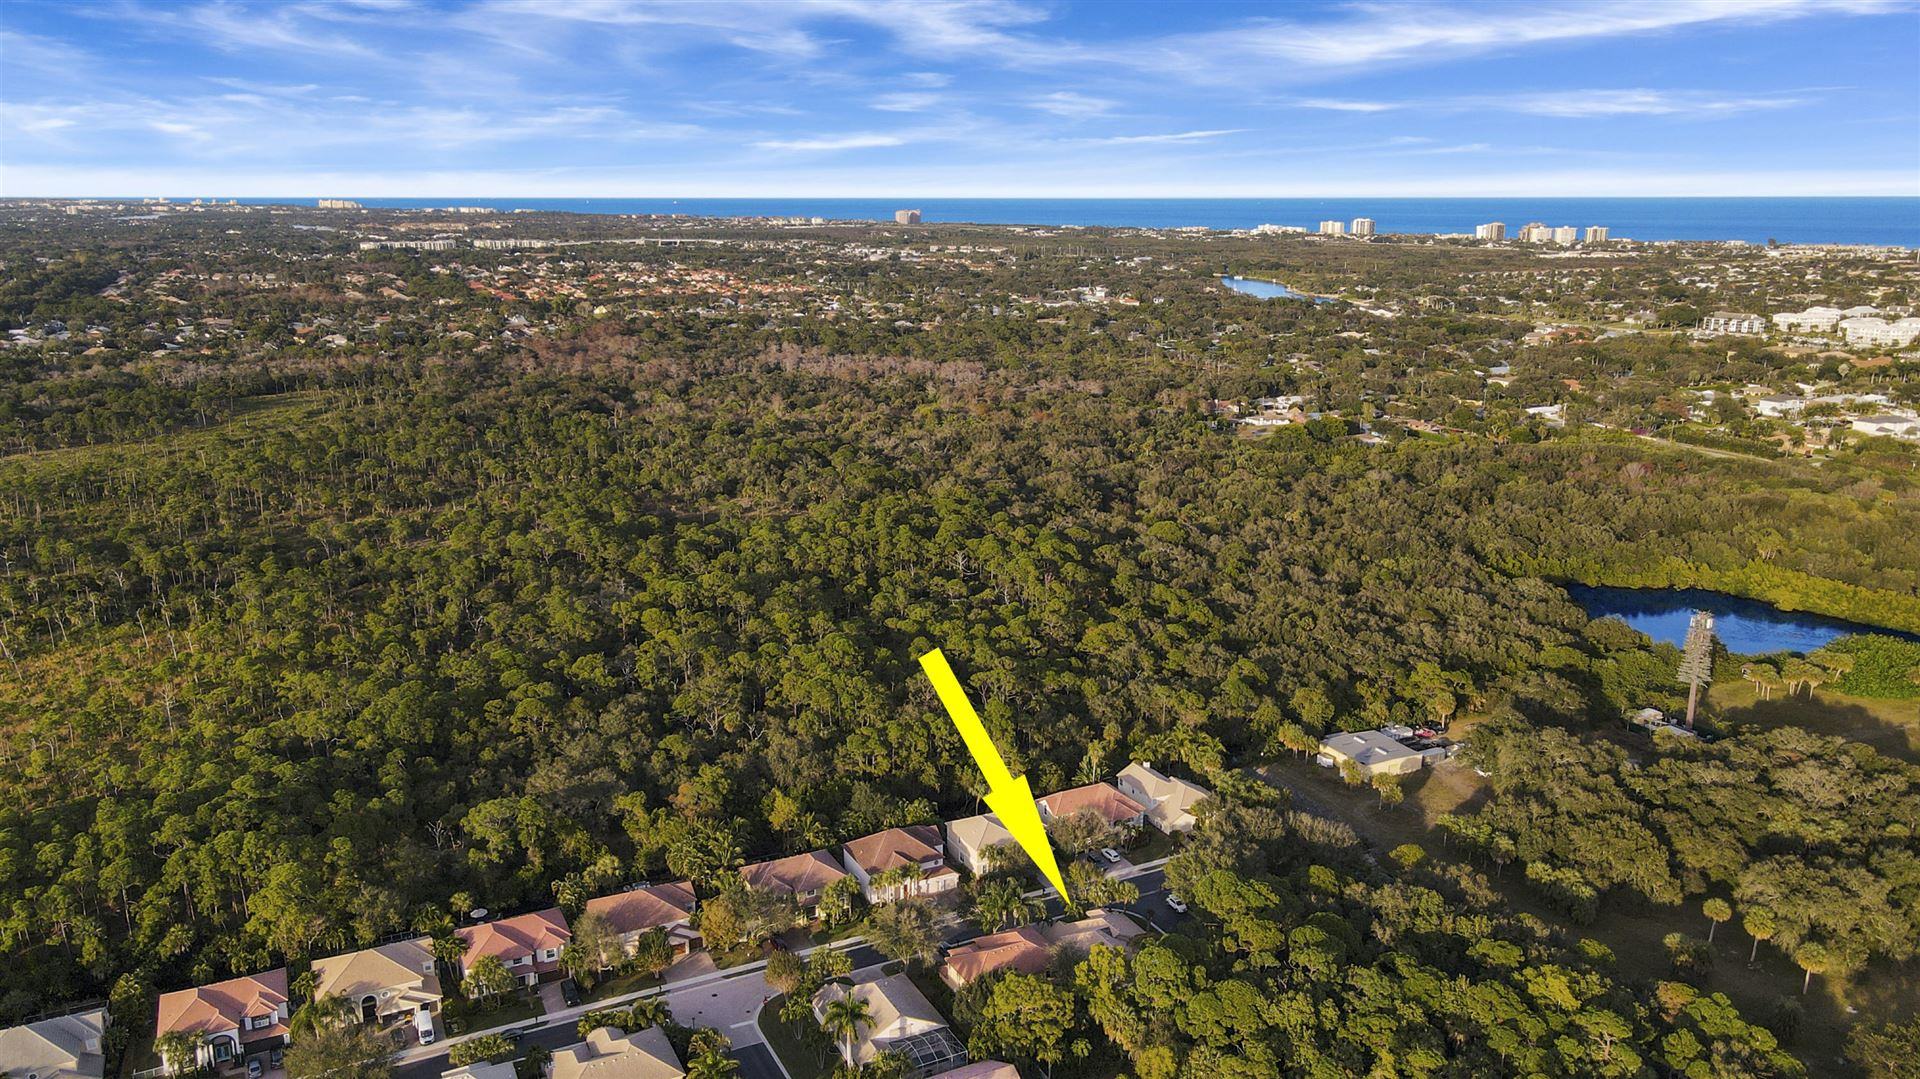 Photo of 193 Lone Pine Drive, Palm Beach Gardens, FL 33410 (MLS # RX-10686748)